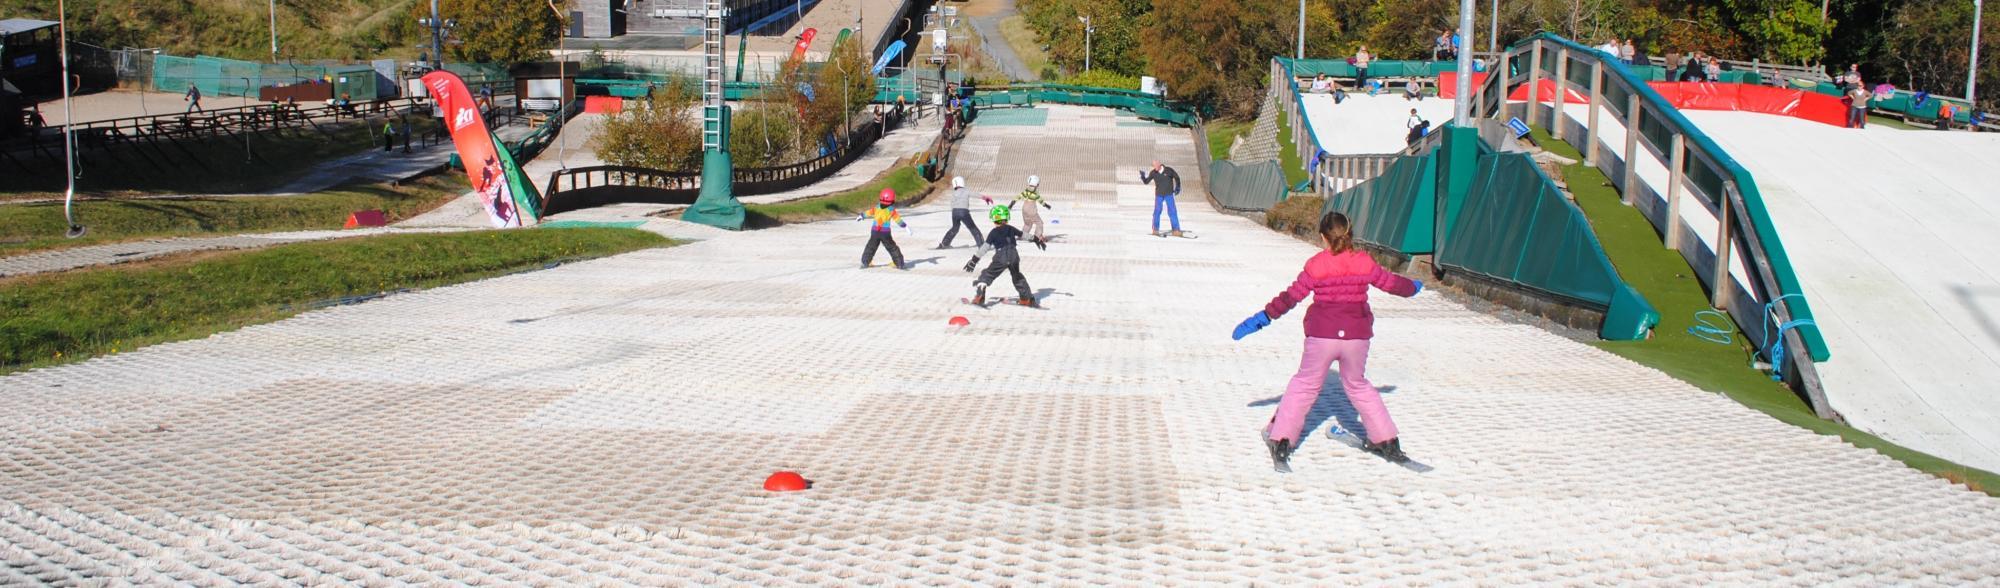 Ski Lessons at ski club of ireland